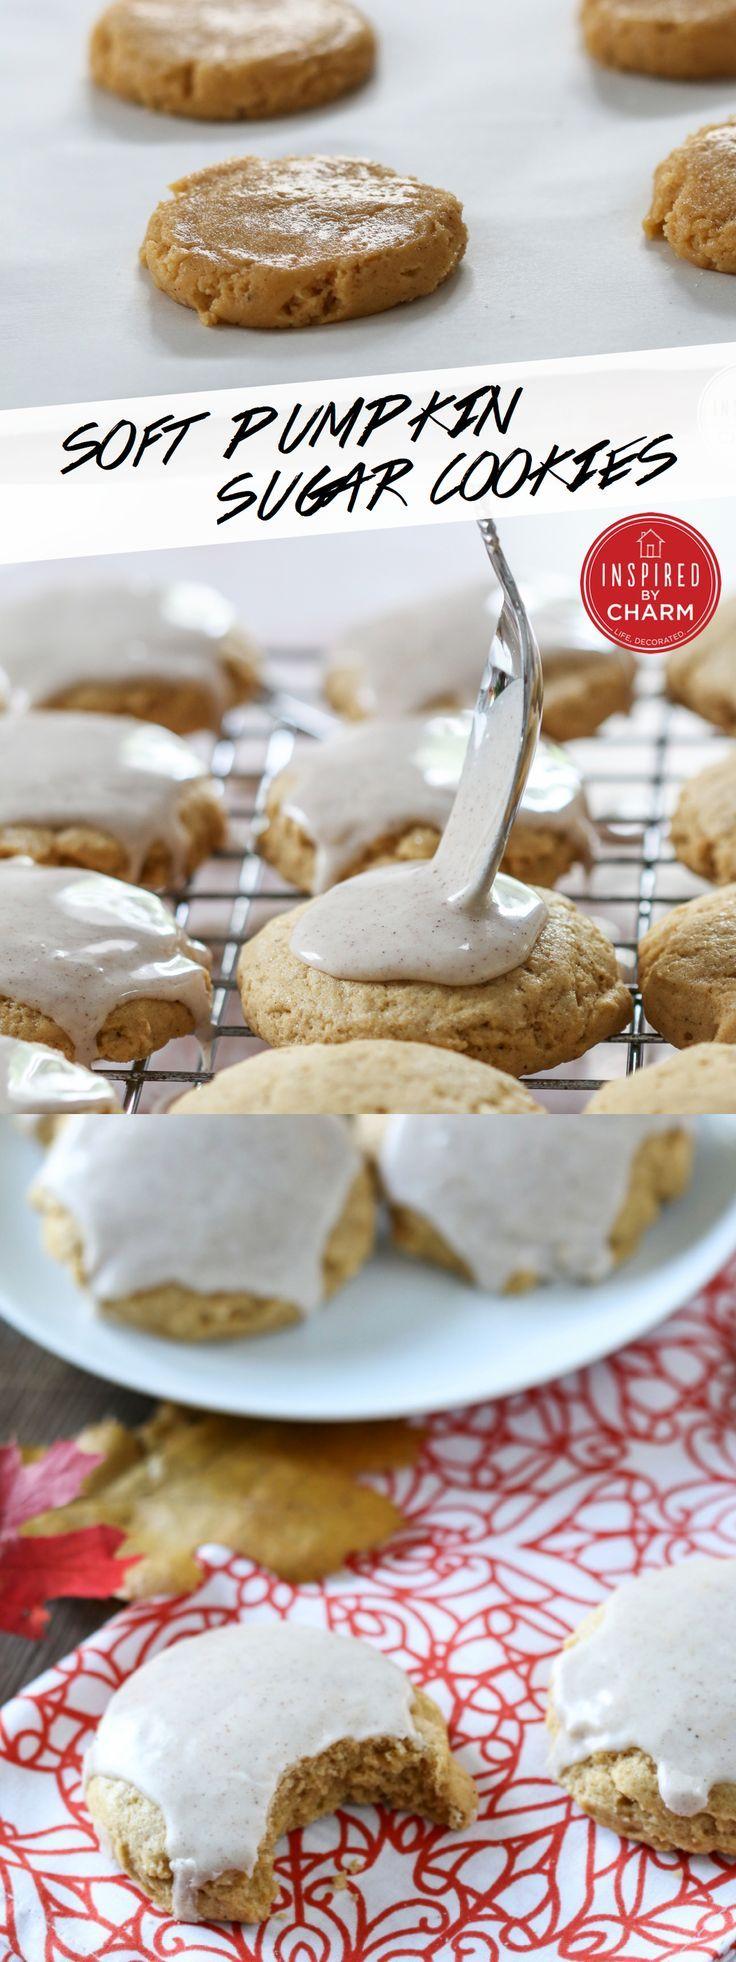 Soft Pumpkin Sugar Cookies - Fall Baking Recipes